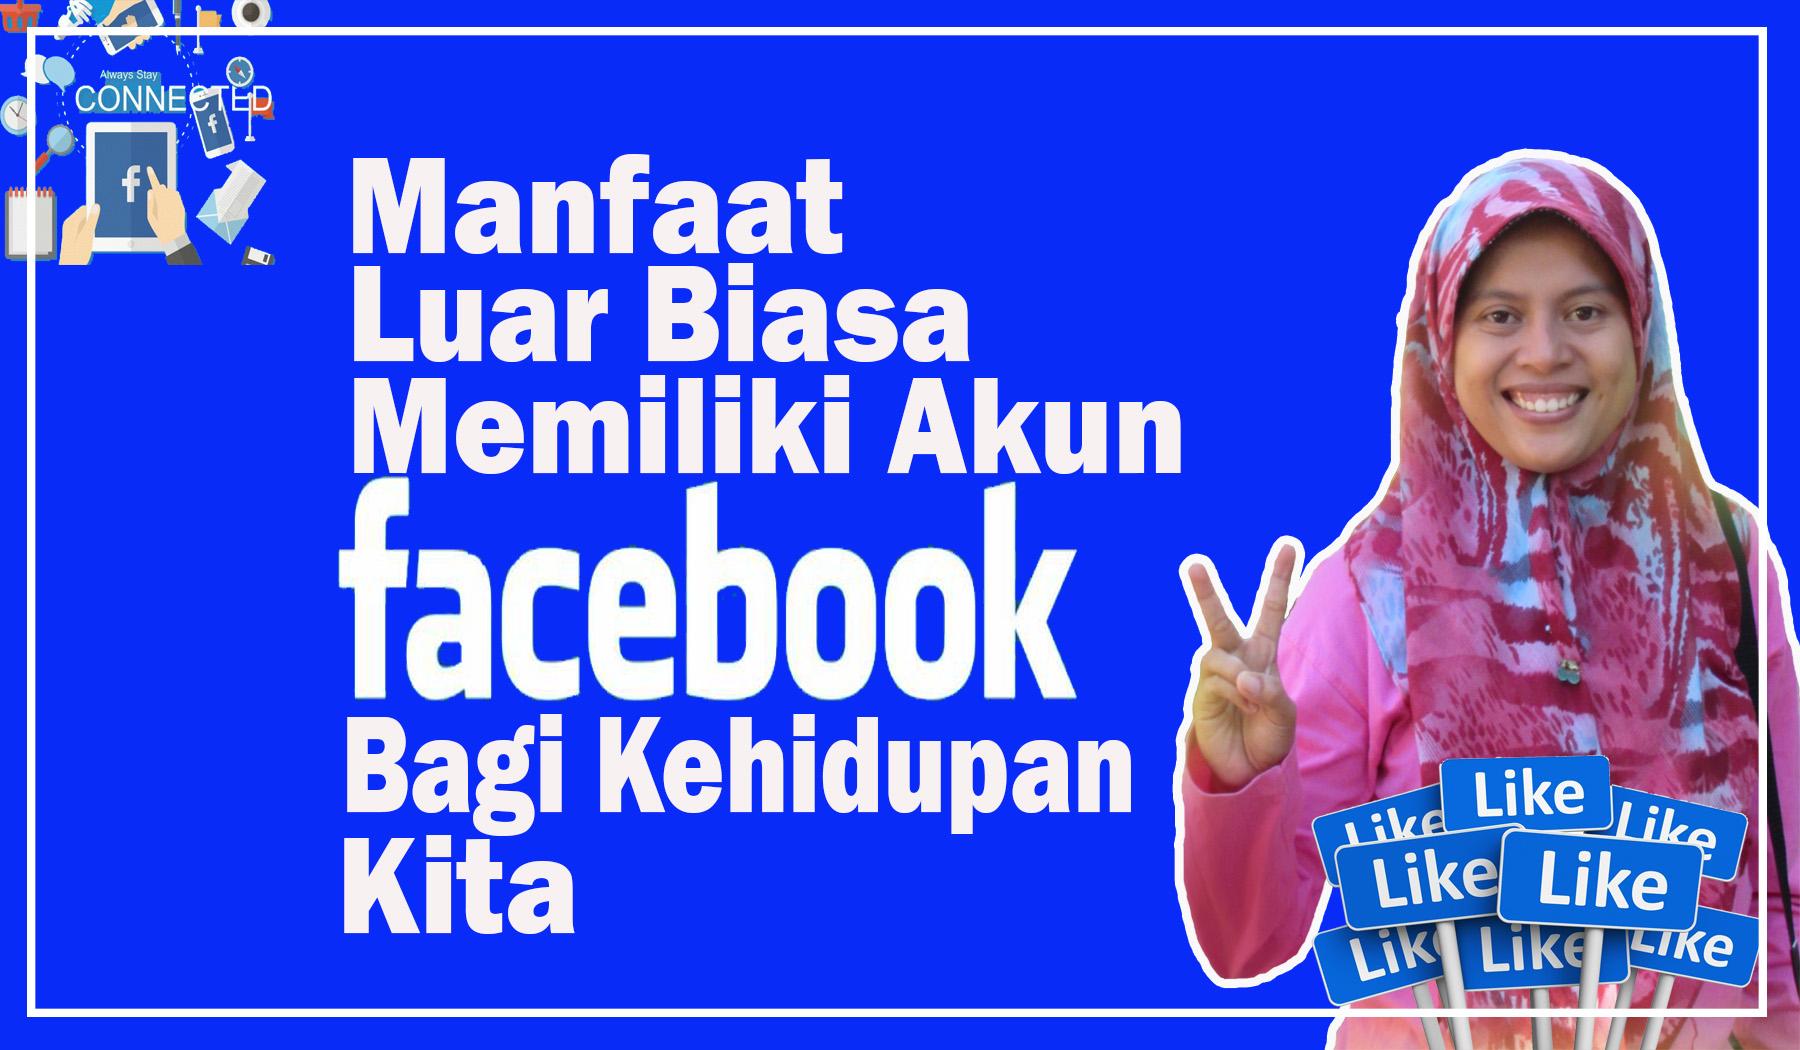 Manfaat Luar Biasa Memiliki Akun Facebook Bagi Kehidupan Kita